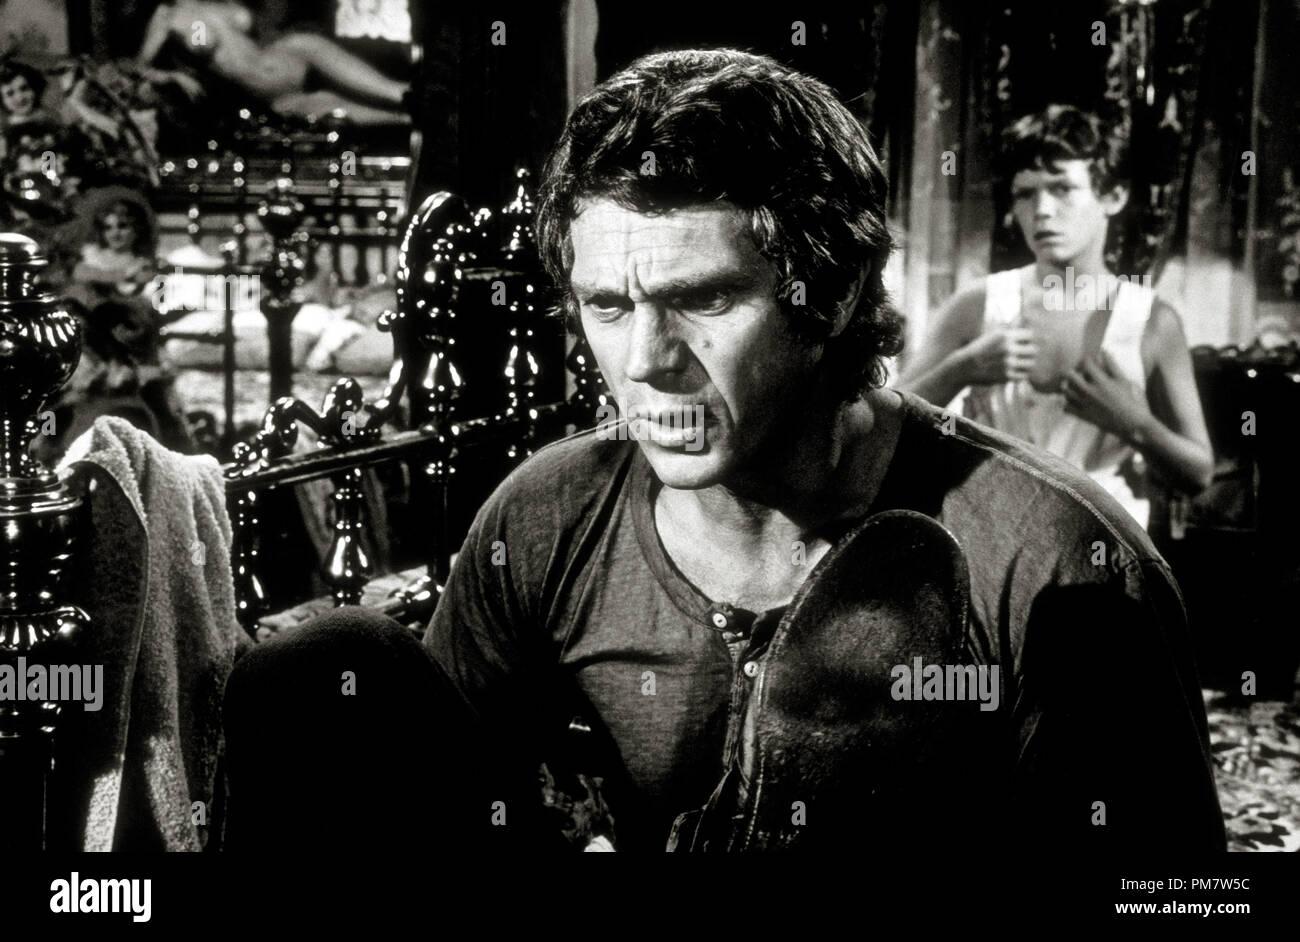 (Archival Classic Cinema - Steve McQueen Retrospective) Steve McQueen 'The Reivers' 1969  File Reference # 31386_899THA - Stock Image